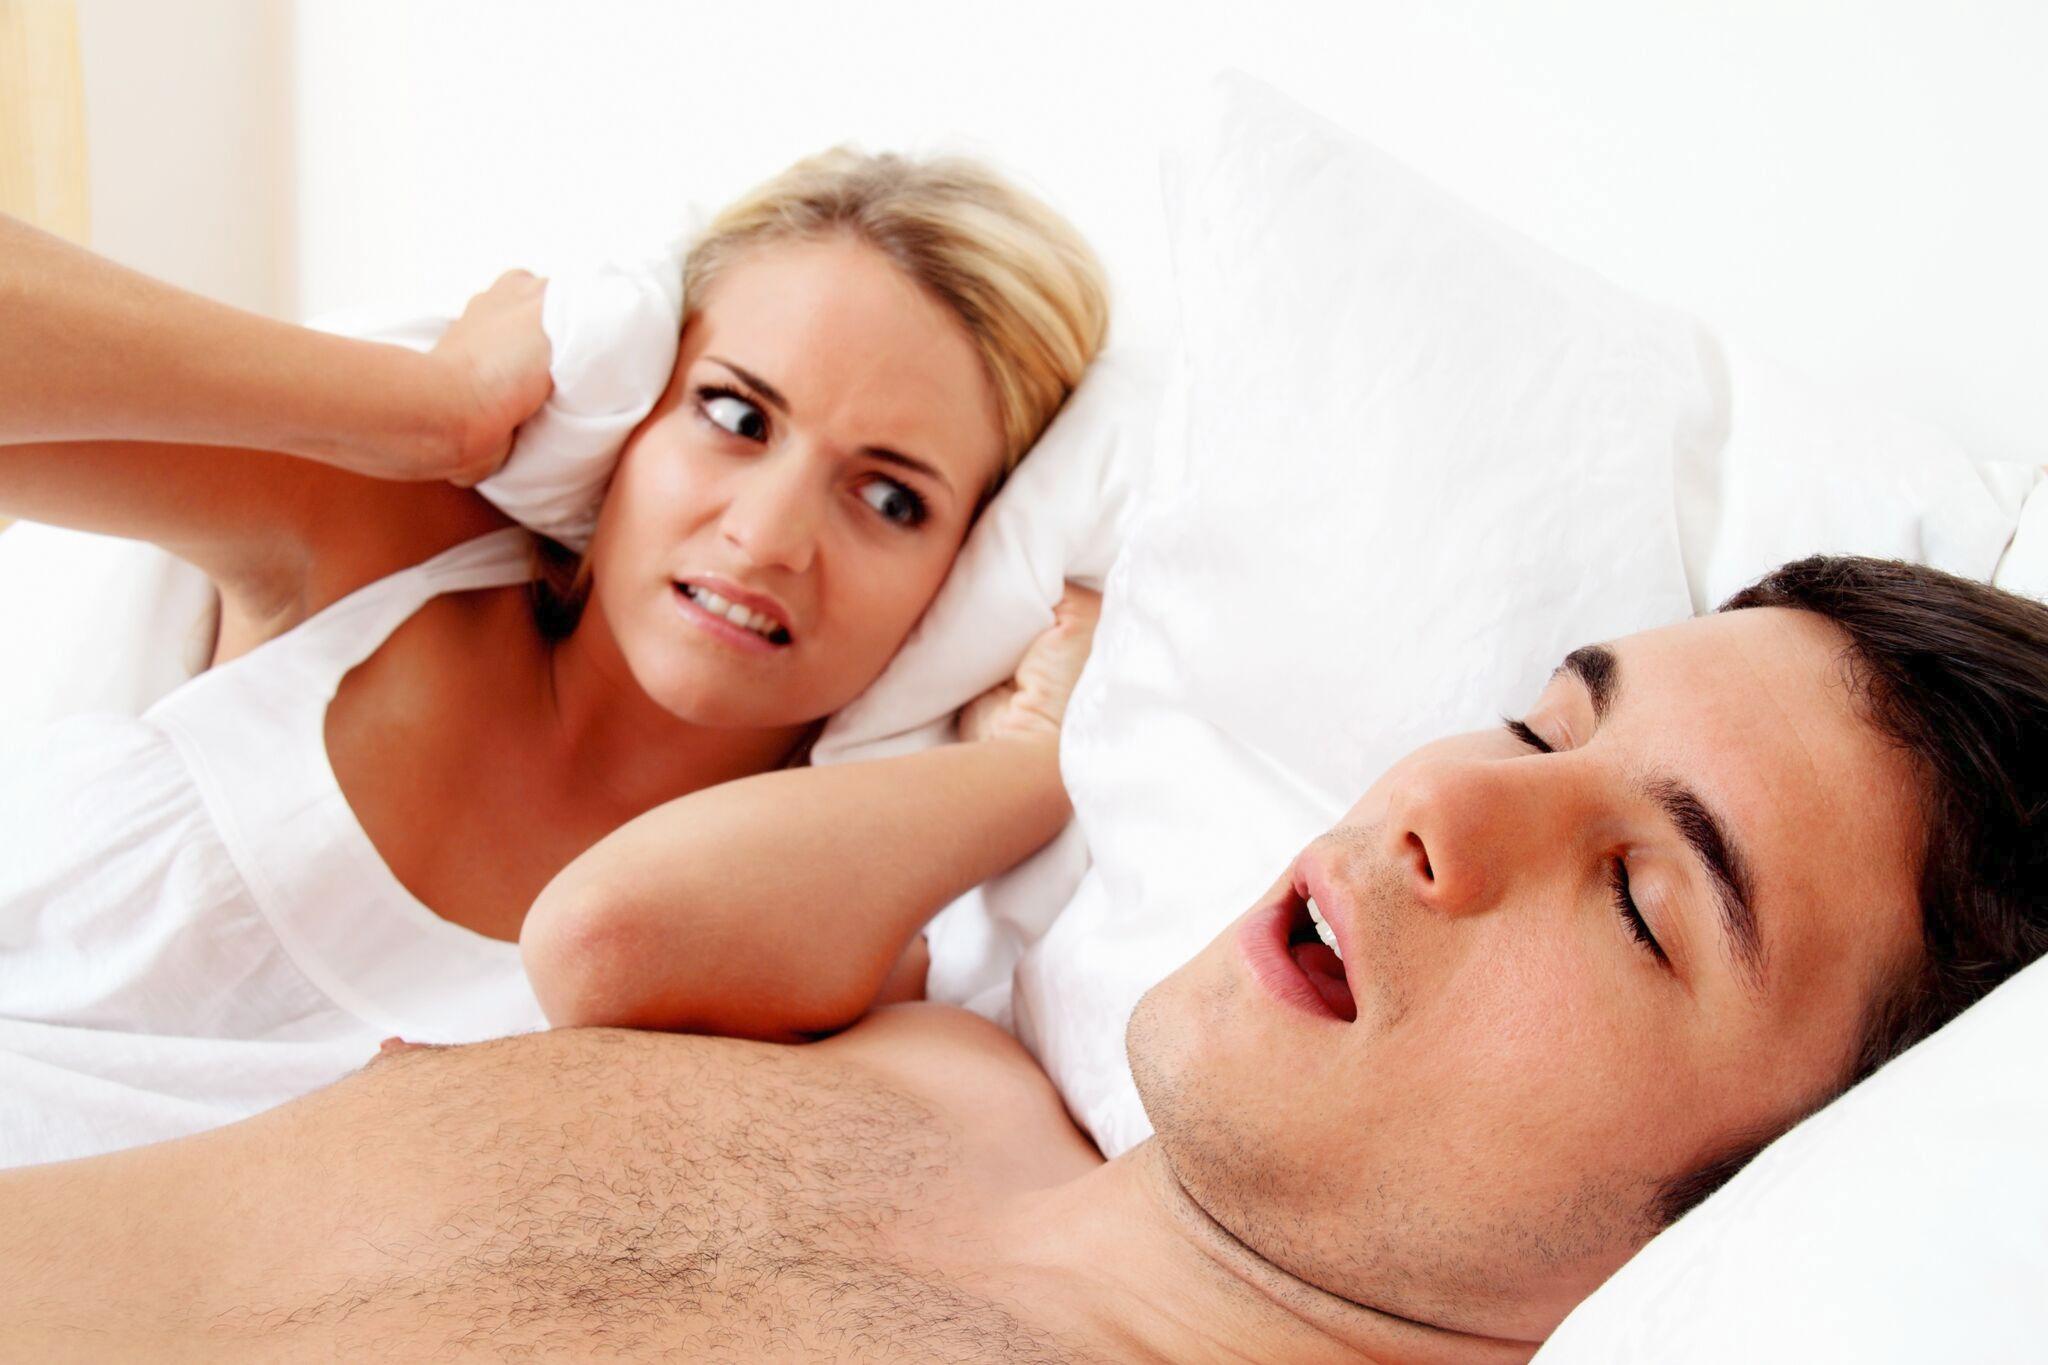 TREATMENT OF SNORING AND SLEEP APNEA